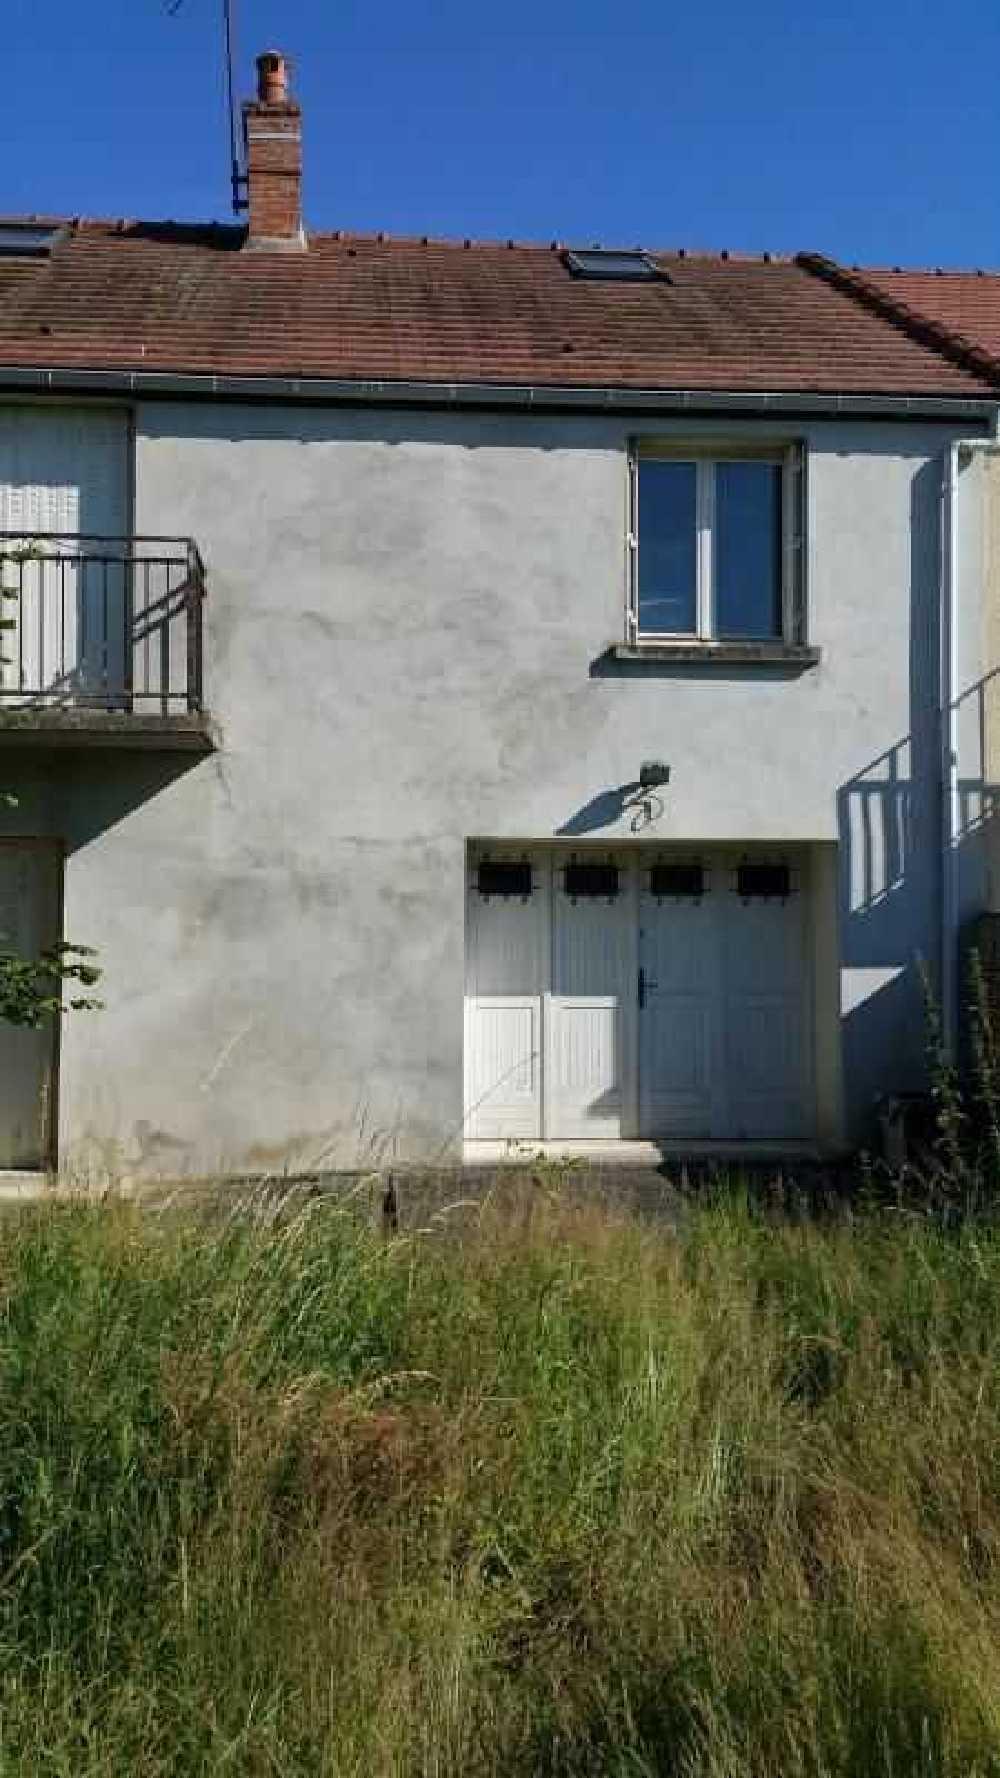 Fontenailles Seine-et-Marne Haus Bild 3798912